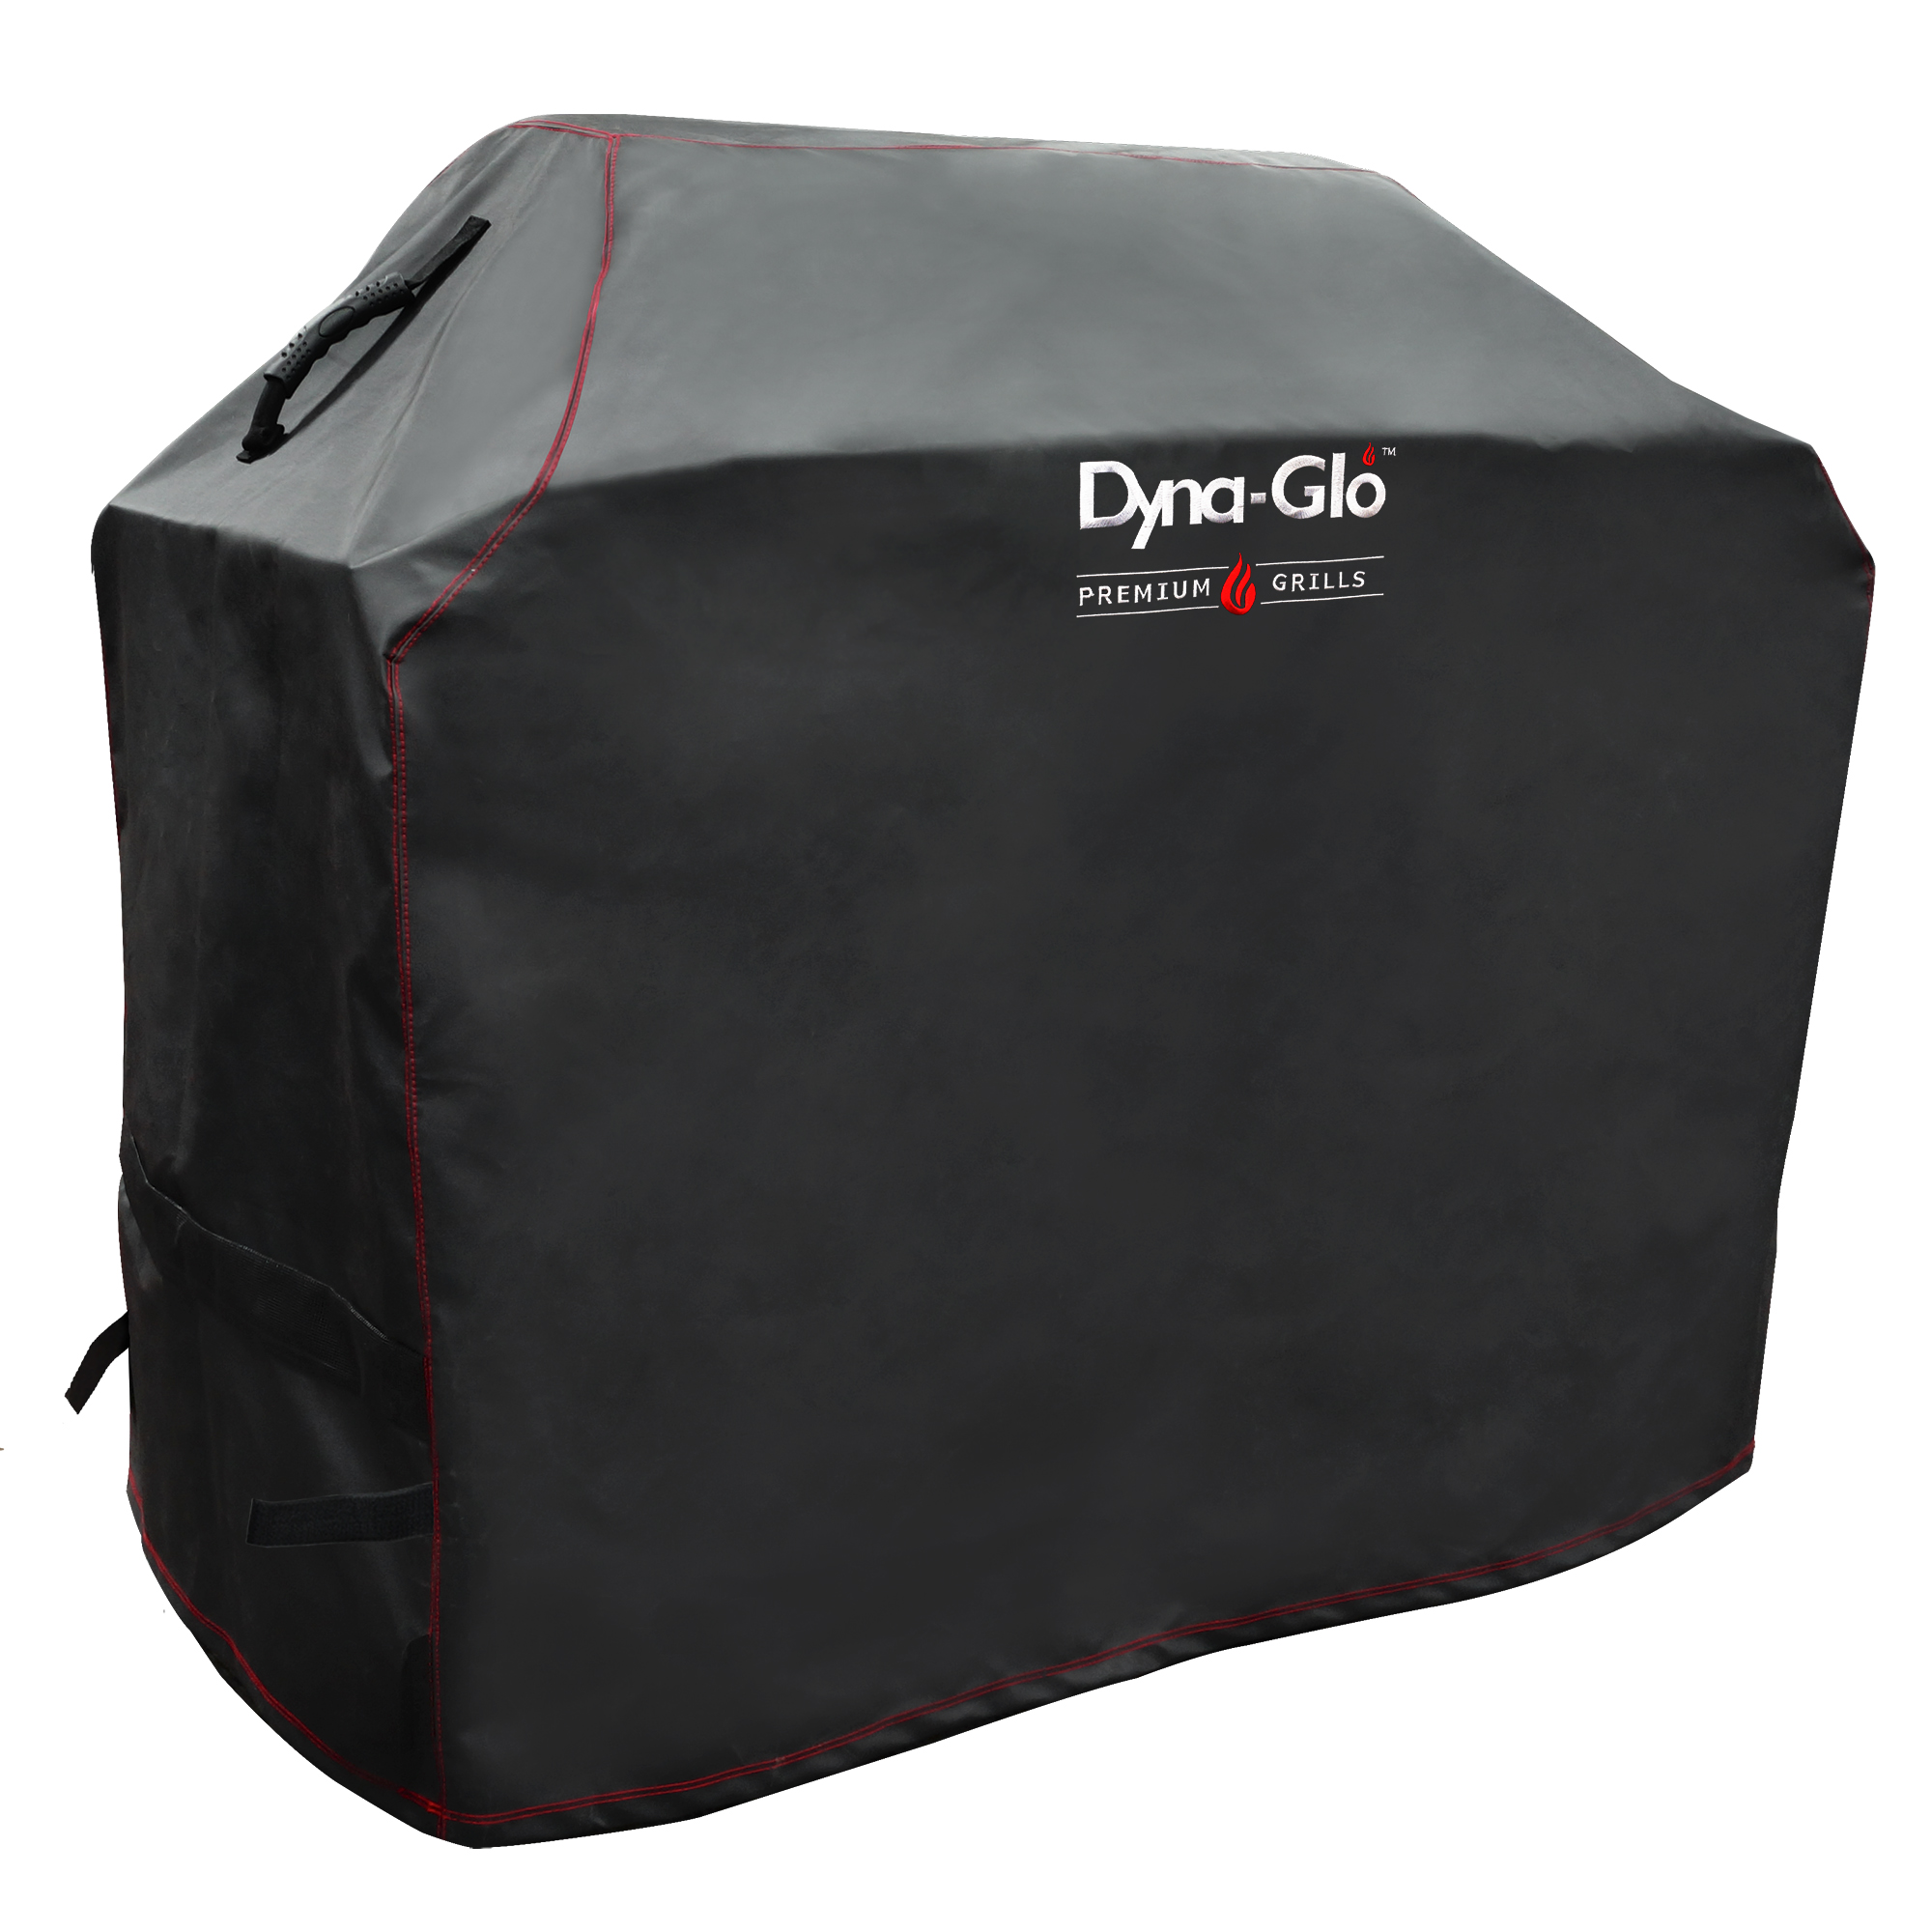 Dyna-Glo Premium 5 Burner Gas Grill Cover